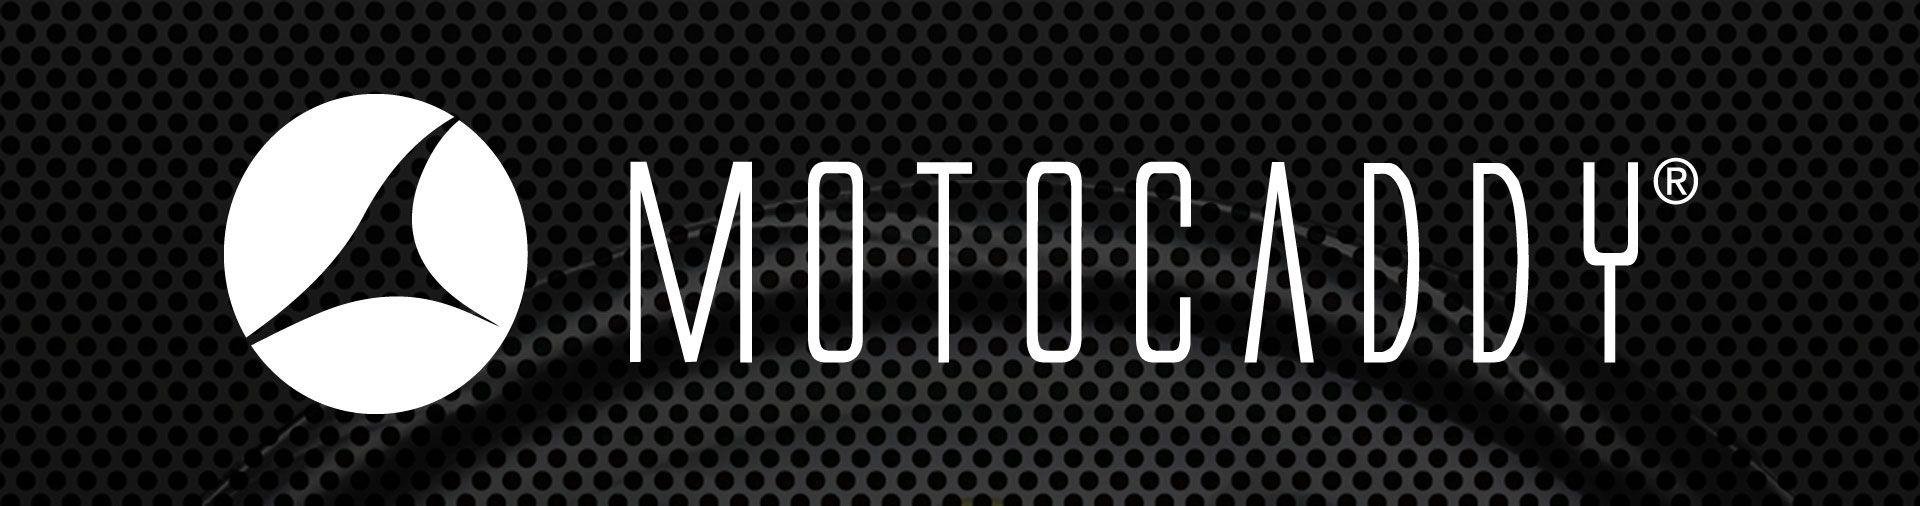 Motocaddy Brand